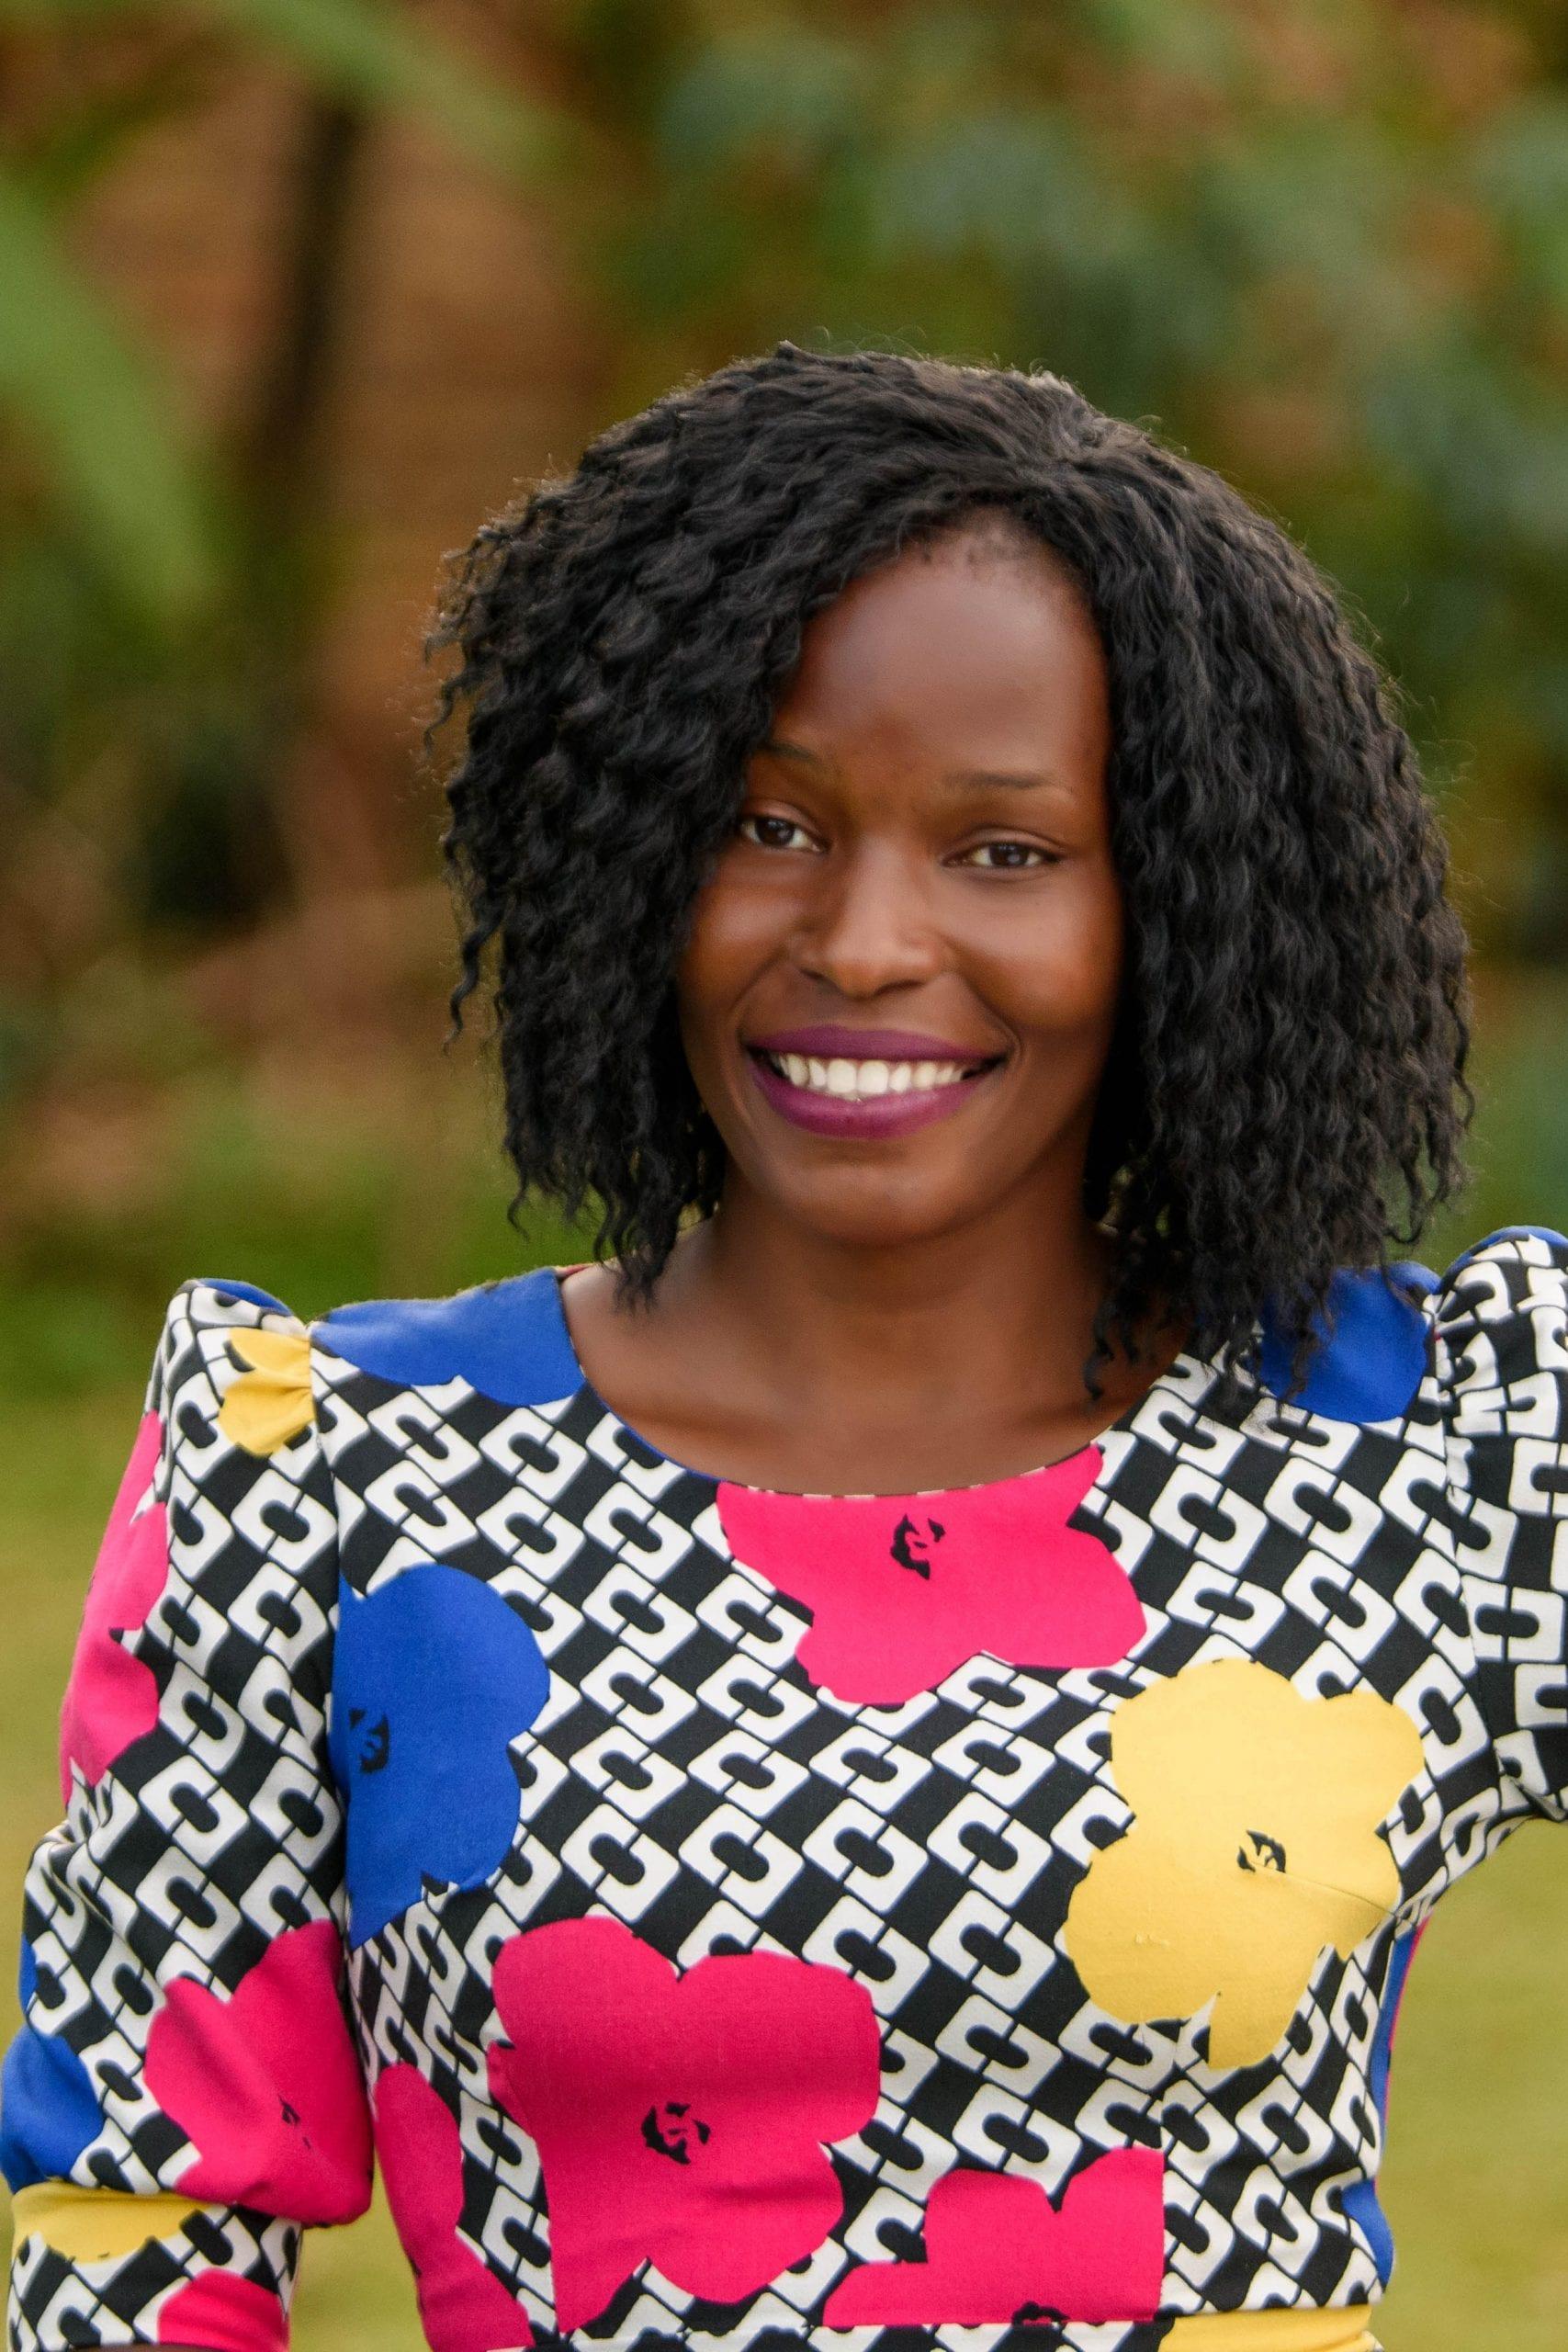 Winnie Namulindwa